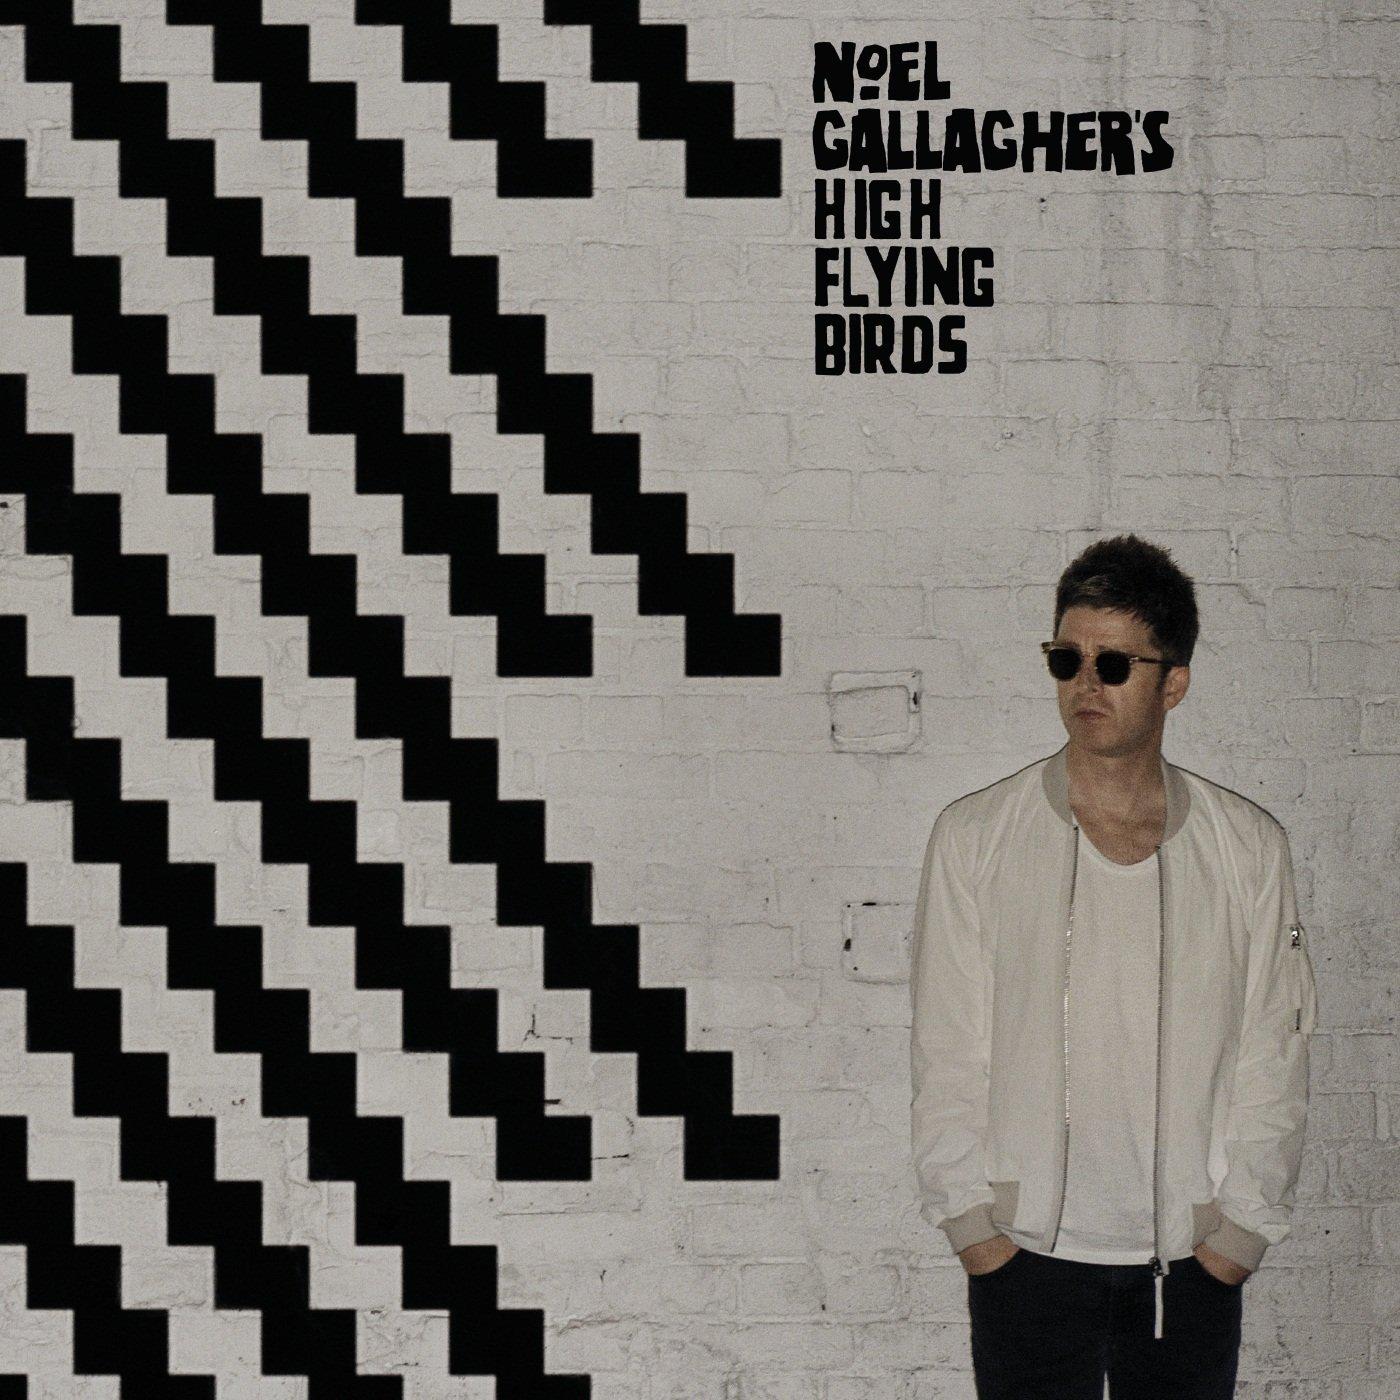 Noel Gallagher's High Flying Birds - Chasing Yesterday dans Musique noel%2Bchasing%2Byesterday